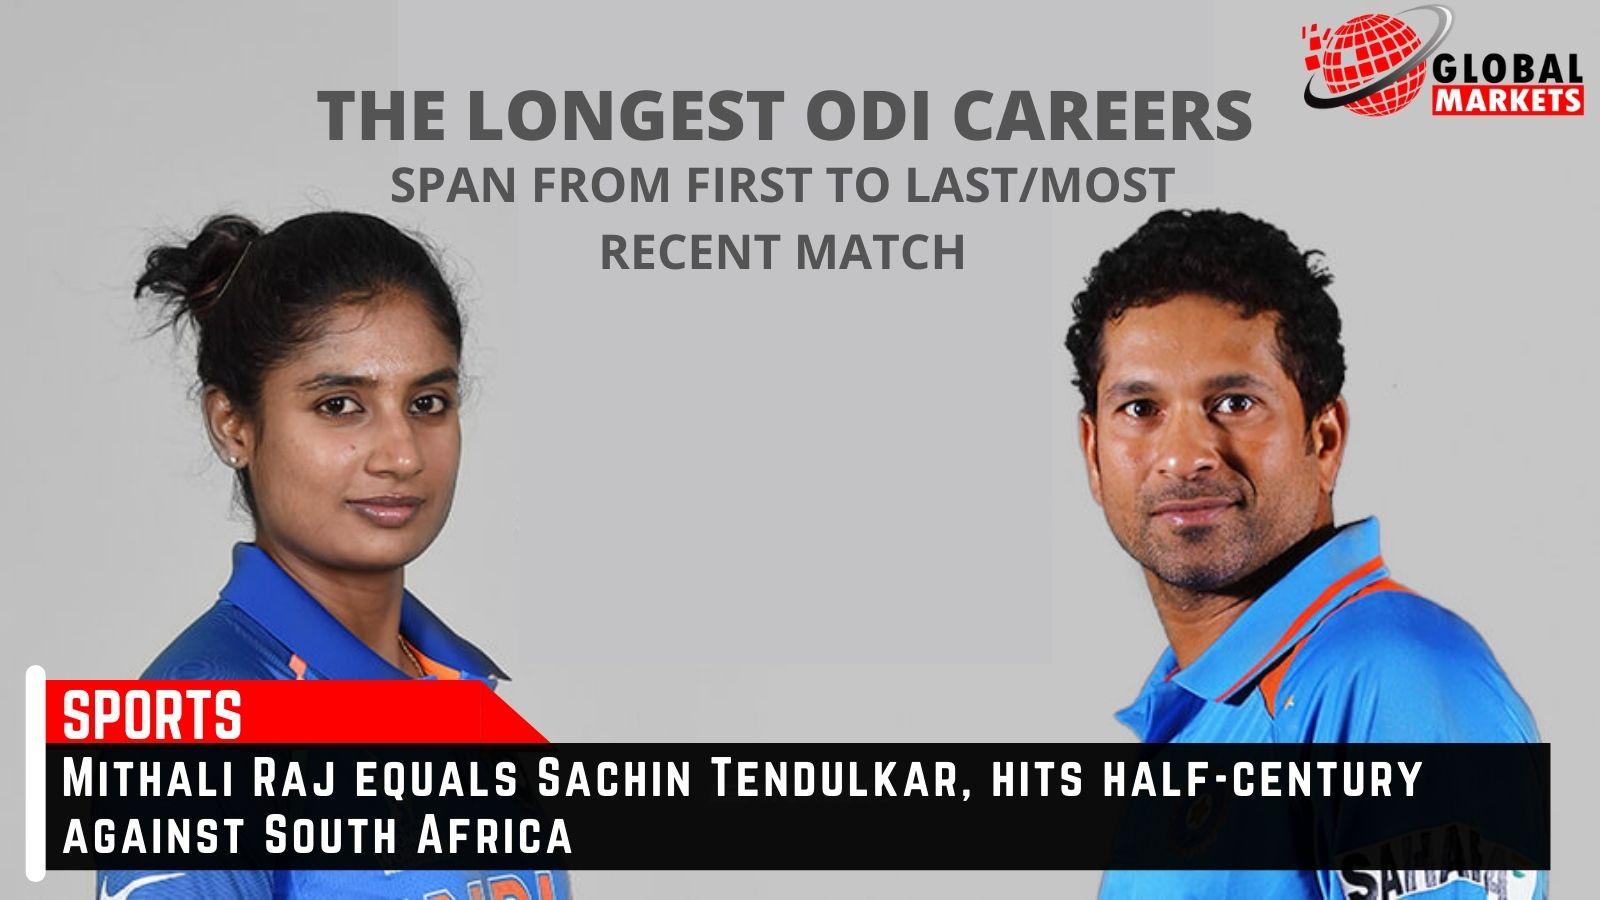 Mithali Raj equals Sachin Tendulkar, hits half-century against SA